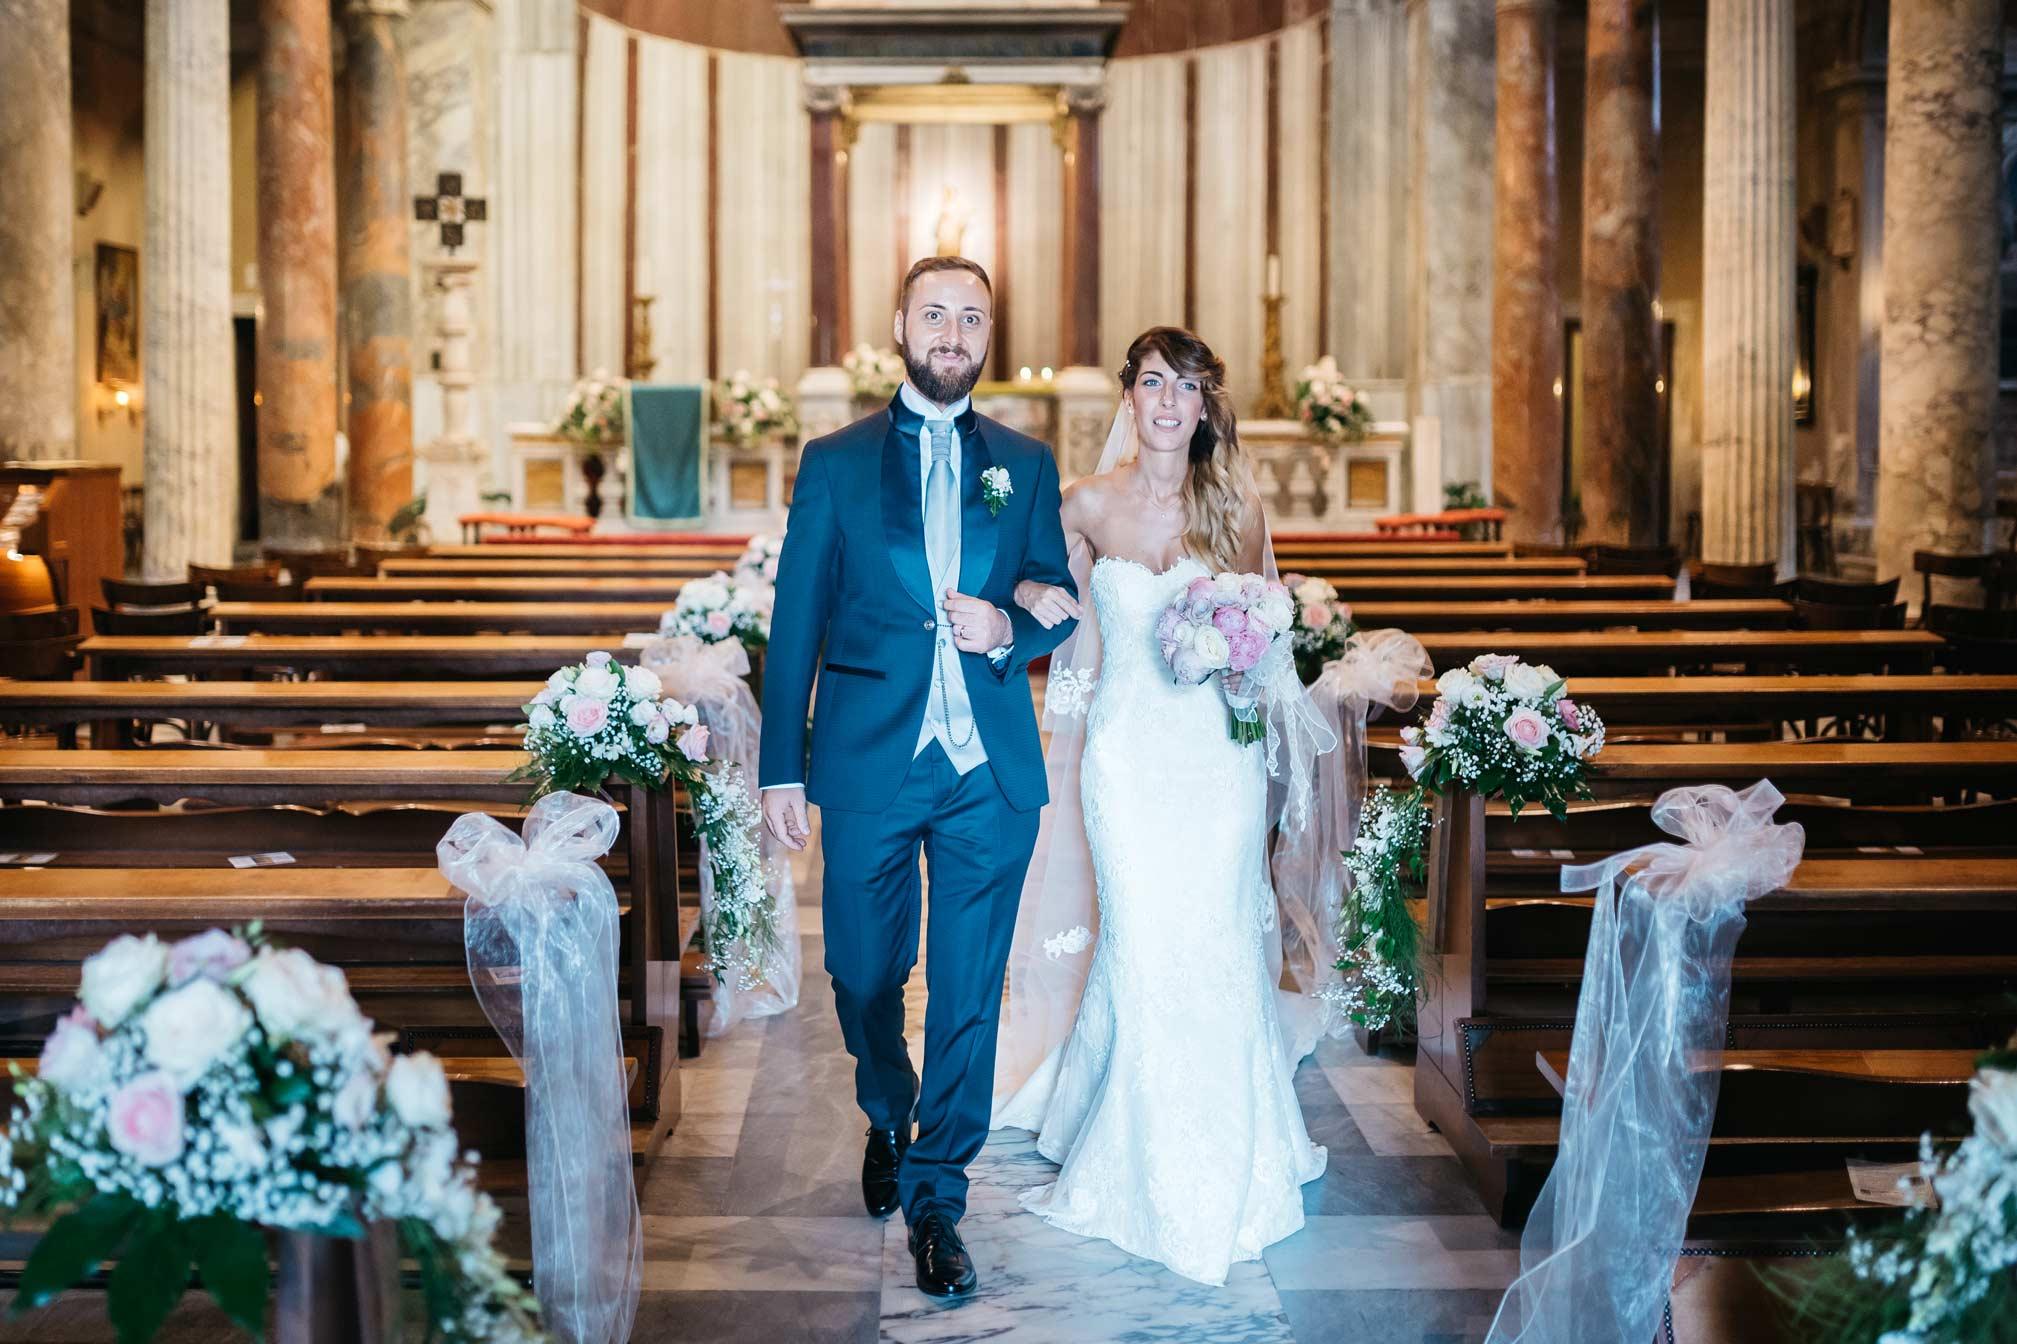 Wedding-Photographer-in-Italy-Documentary-Wedding-Photography-1-Ceremony